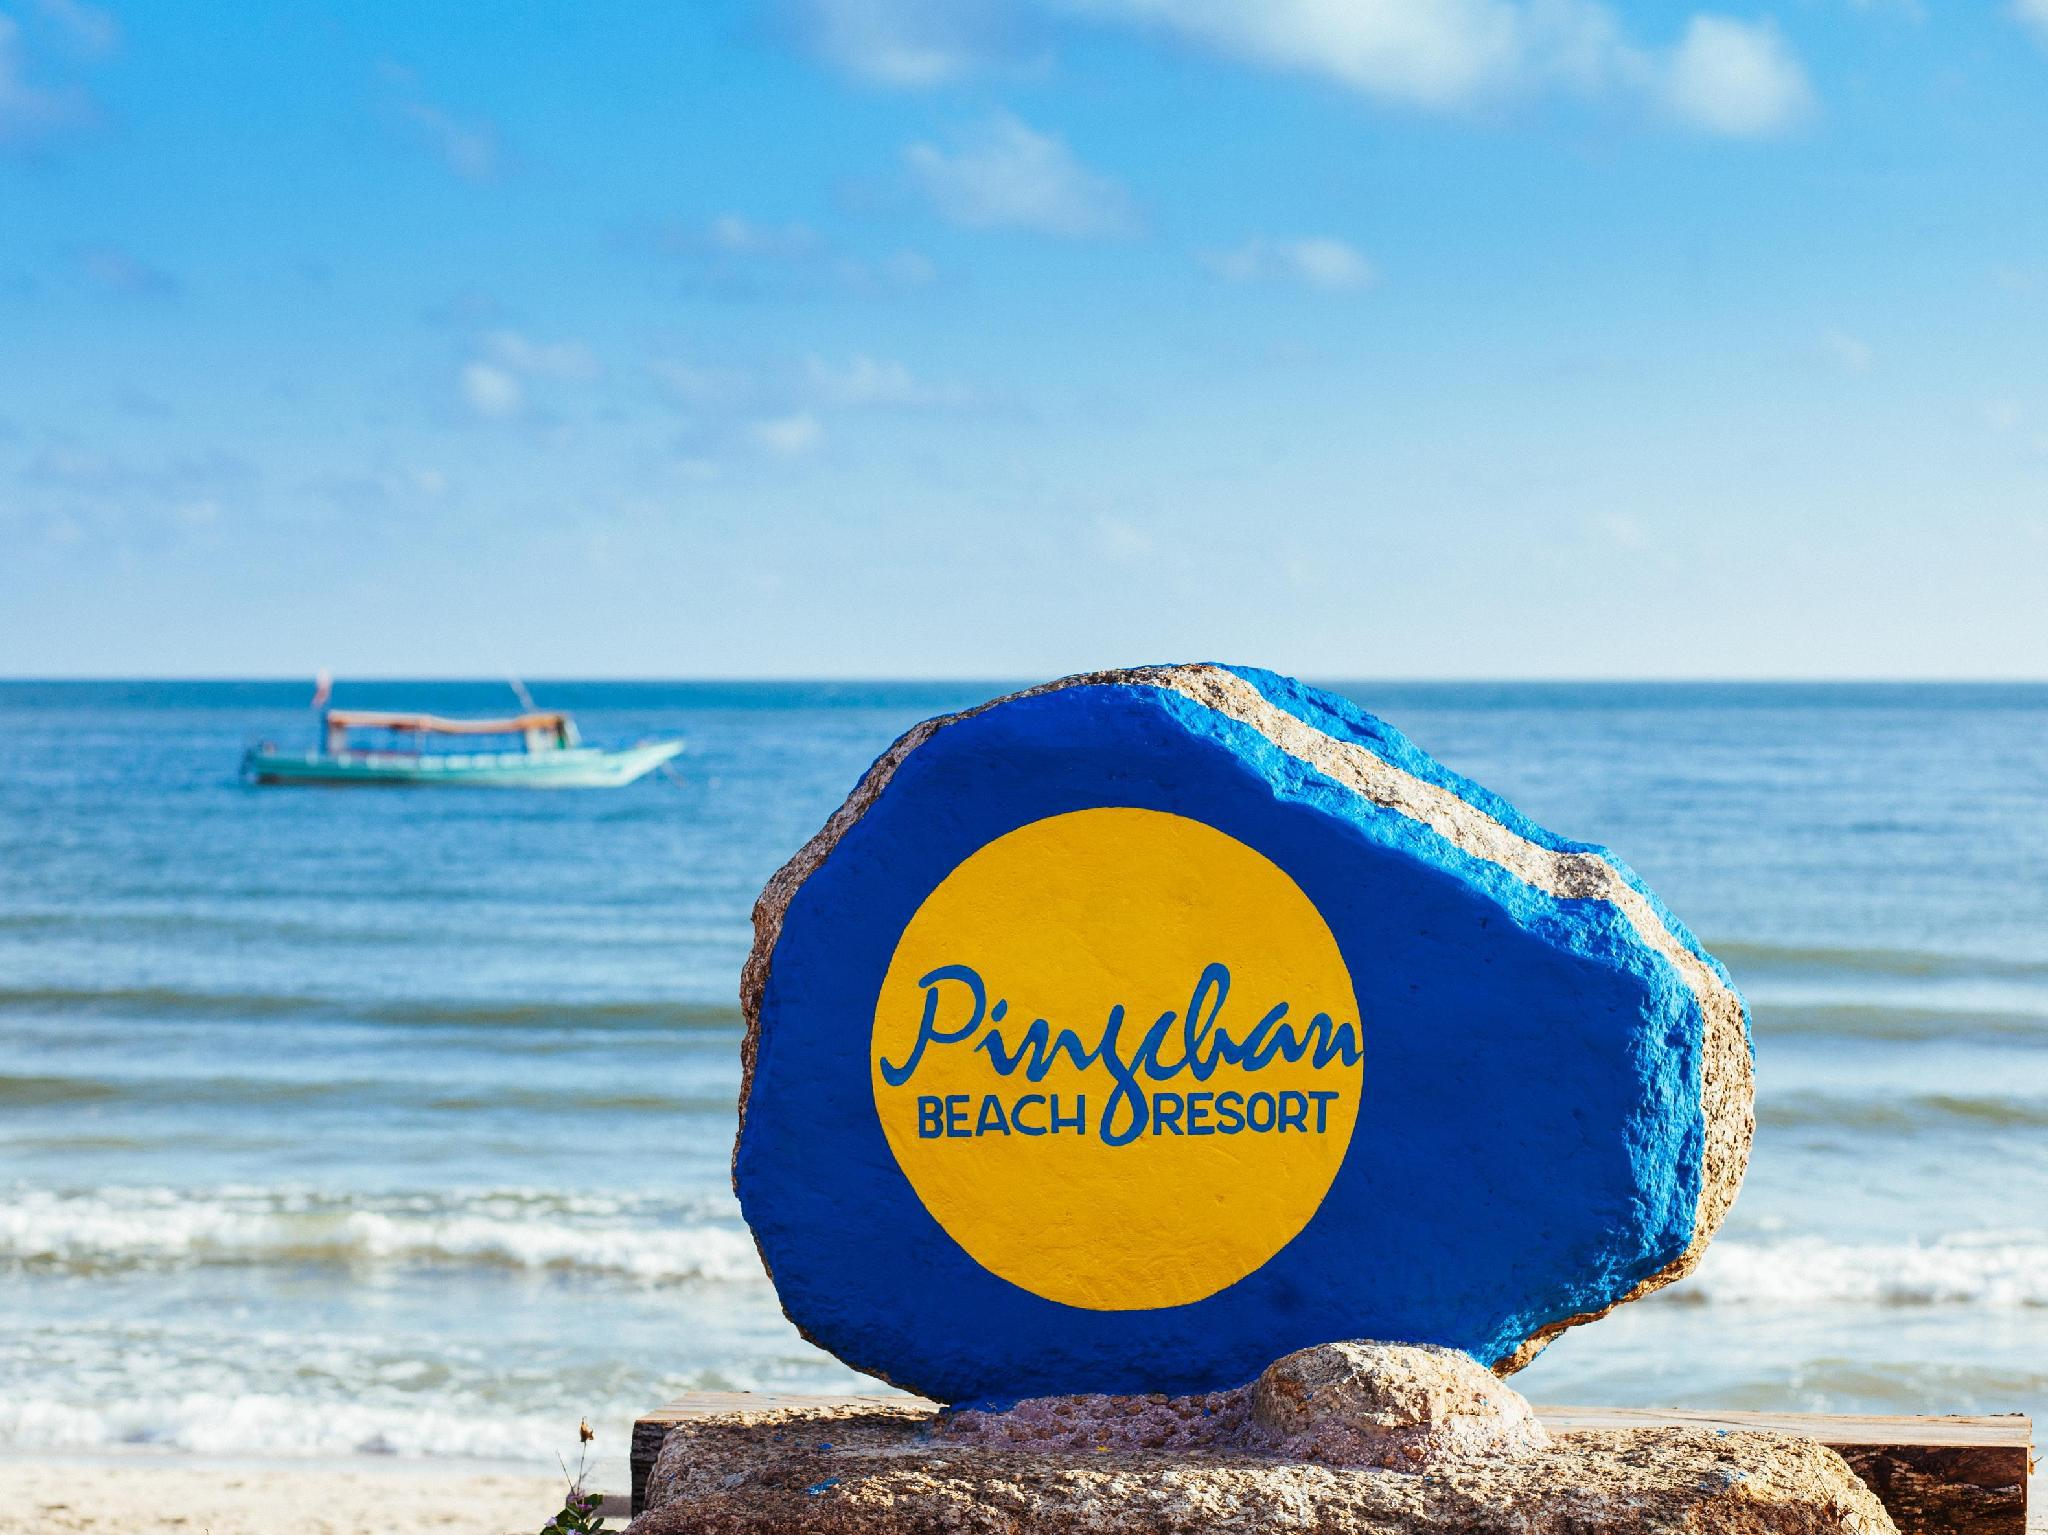 Pingchan Koh Phangan Beachfront Resort พิงจันทร์ เกาะพะงัน บีชฟรอนต์ รีสอร์ต